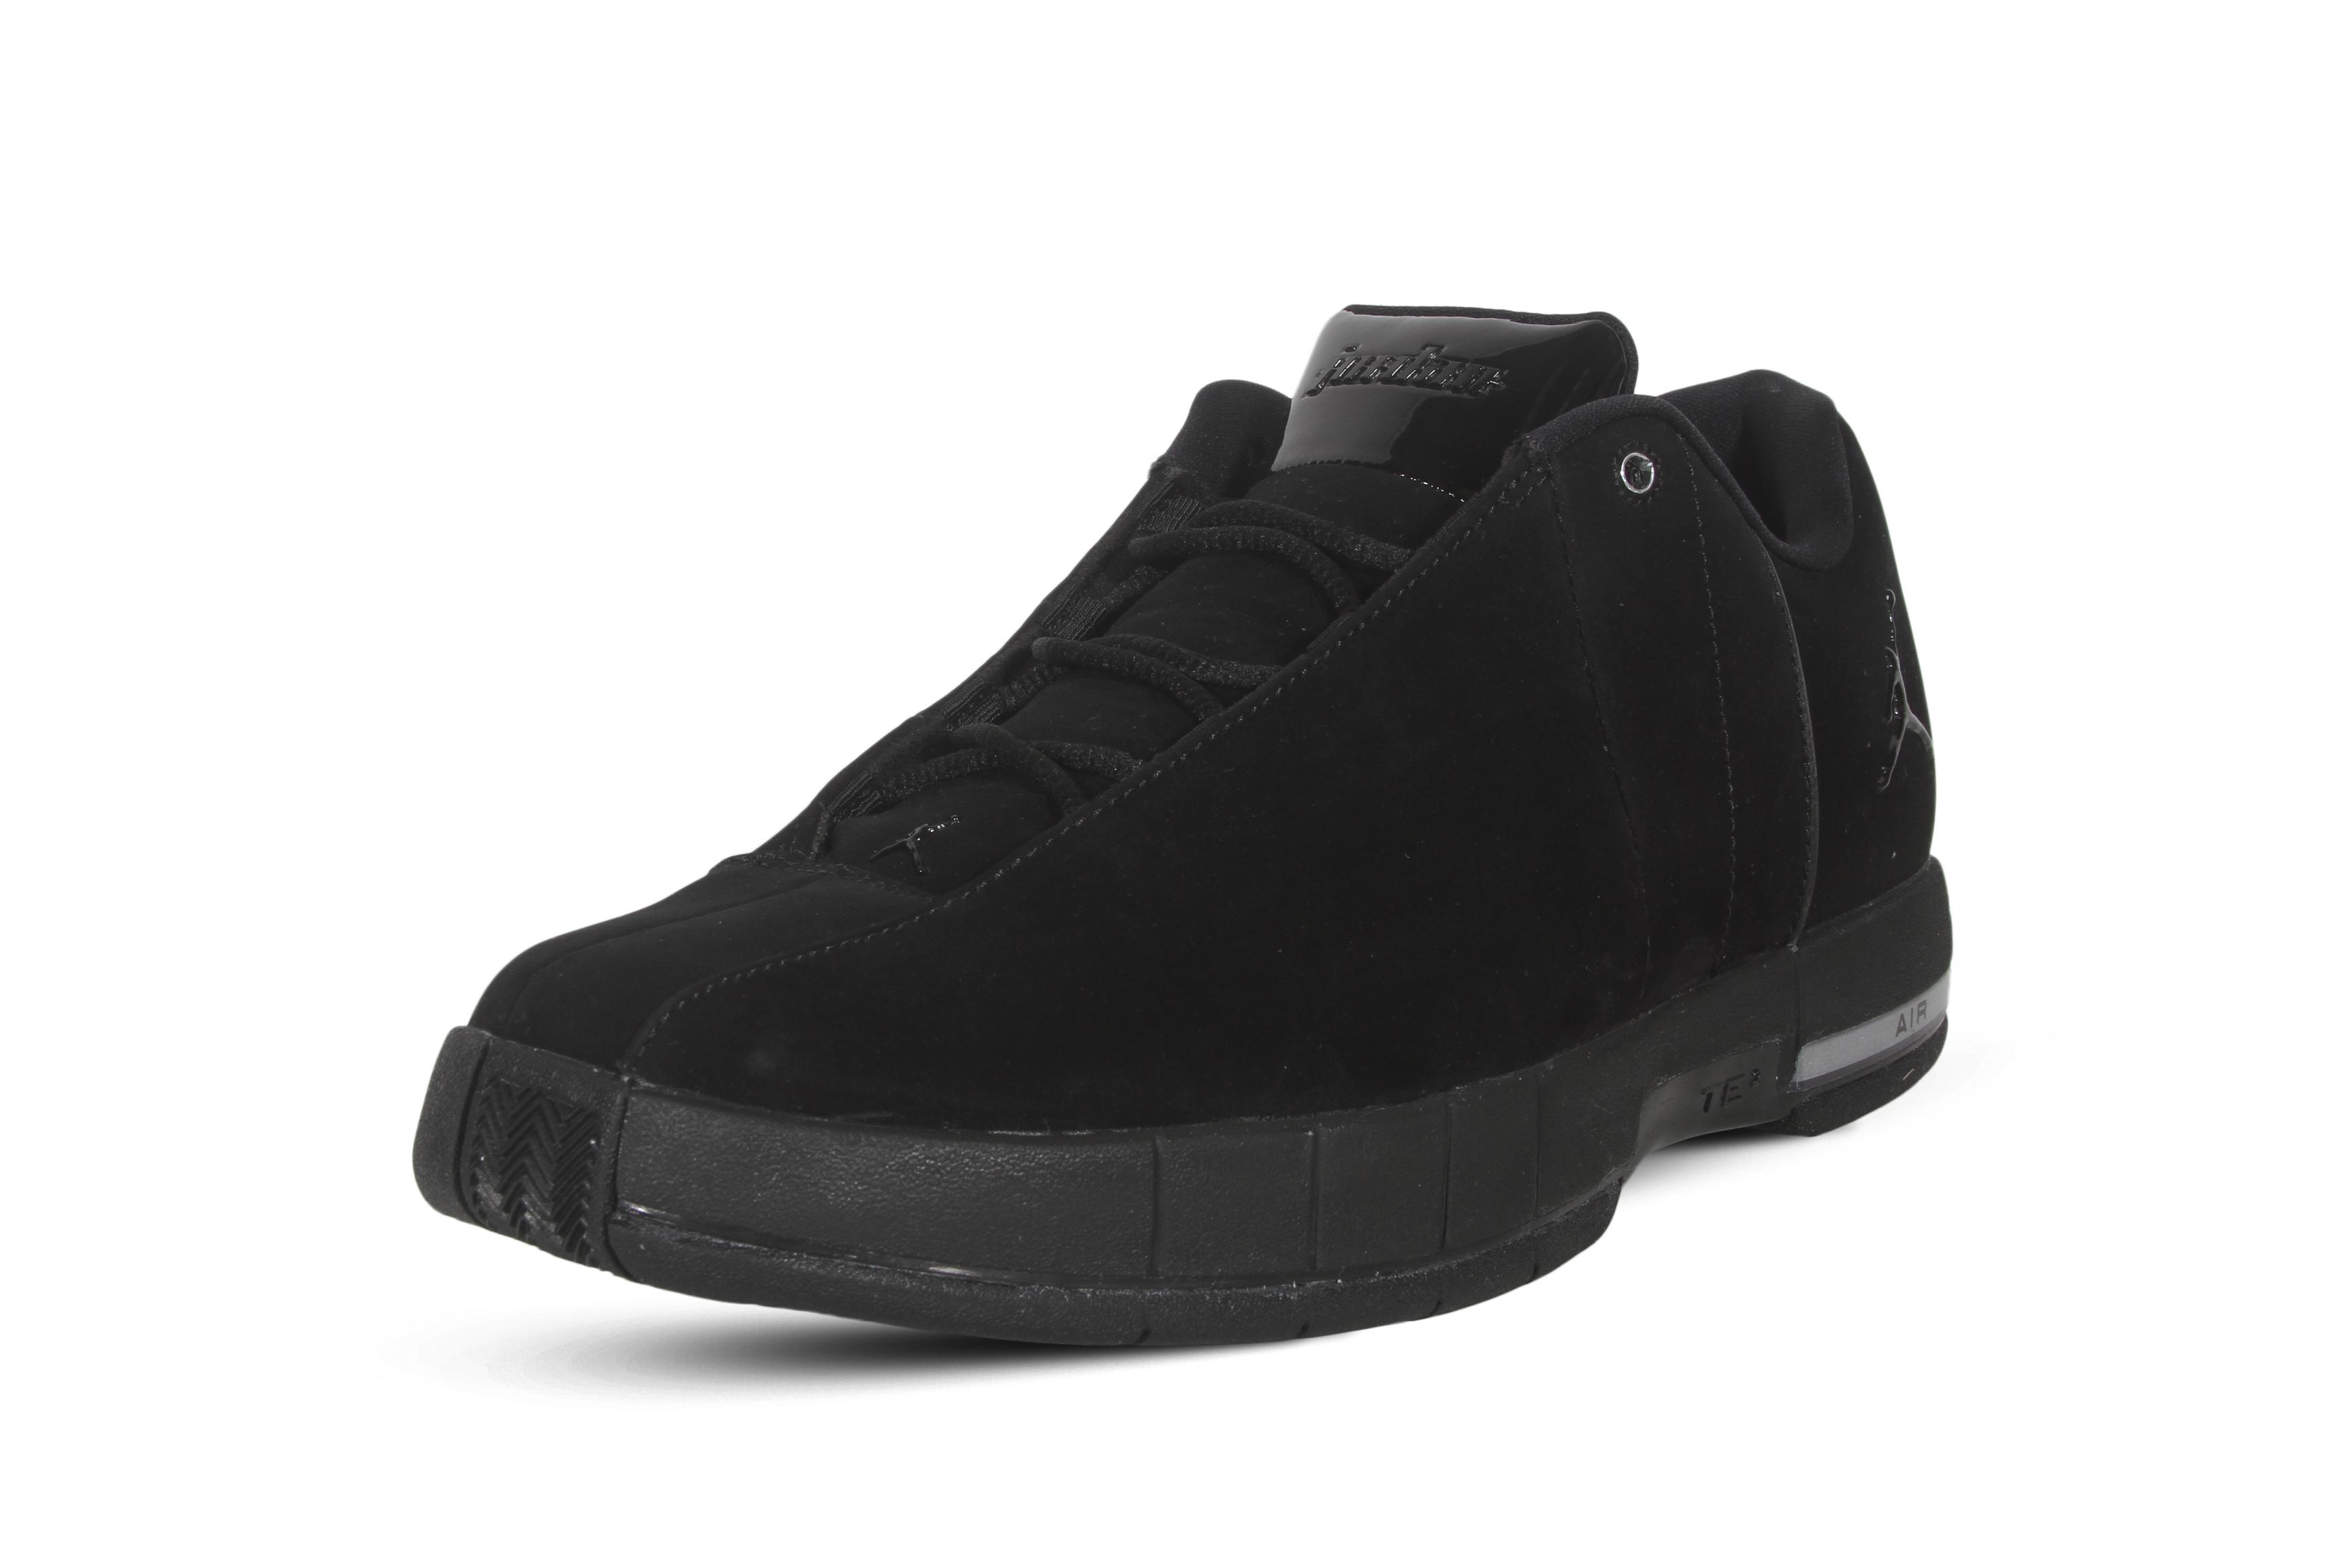 0310891c9d2f2a good selling 7da90 d9433 Jordan Team Elite 2 Low Mens Basketball Shoes  AO1696-003 ...